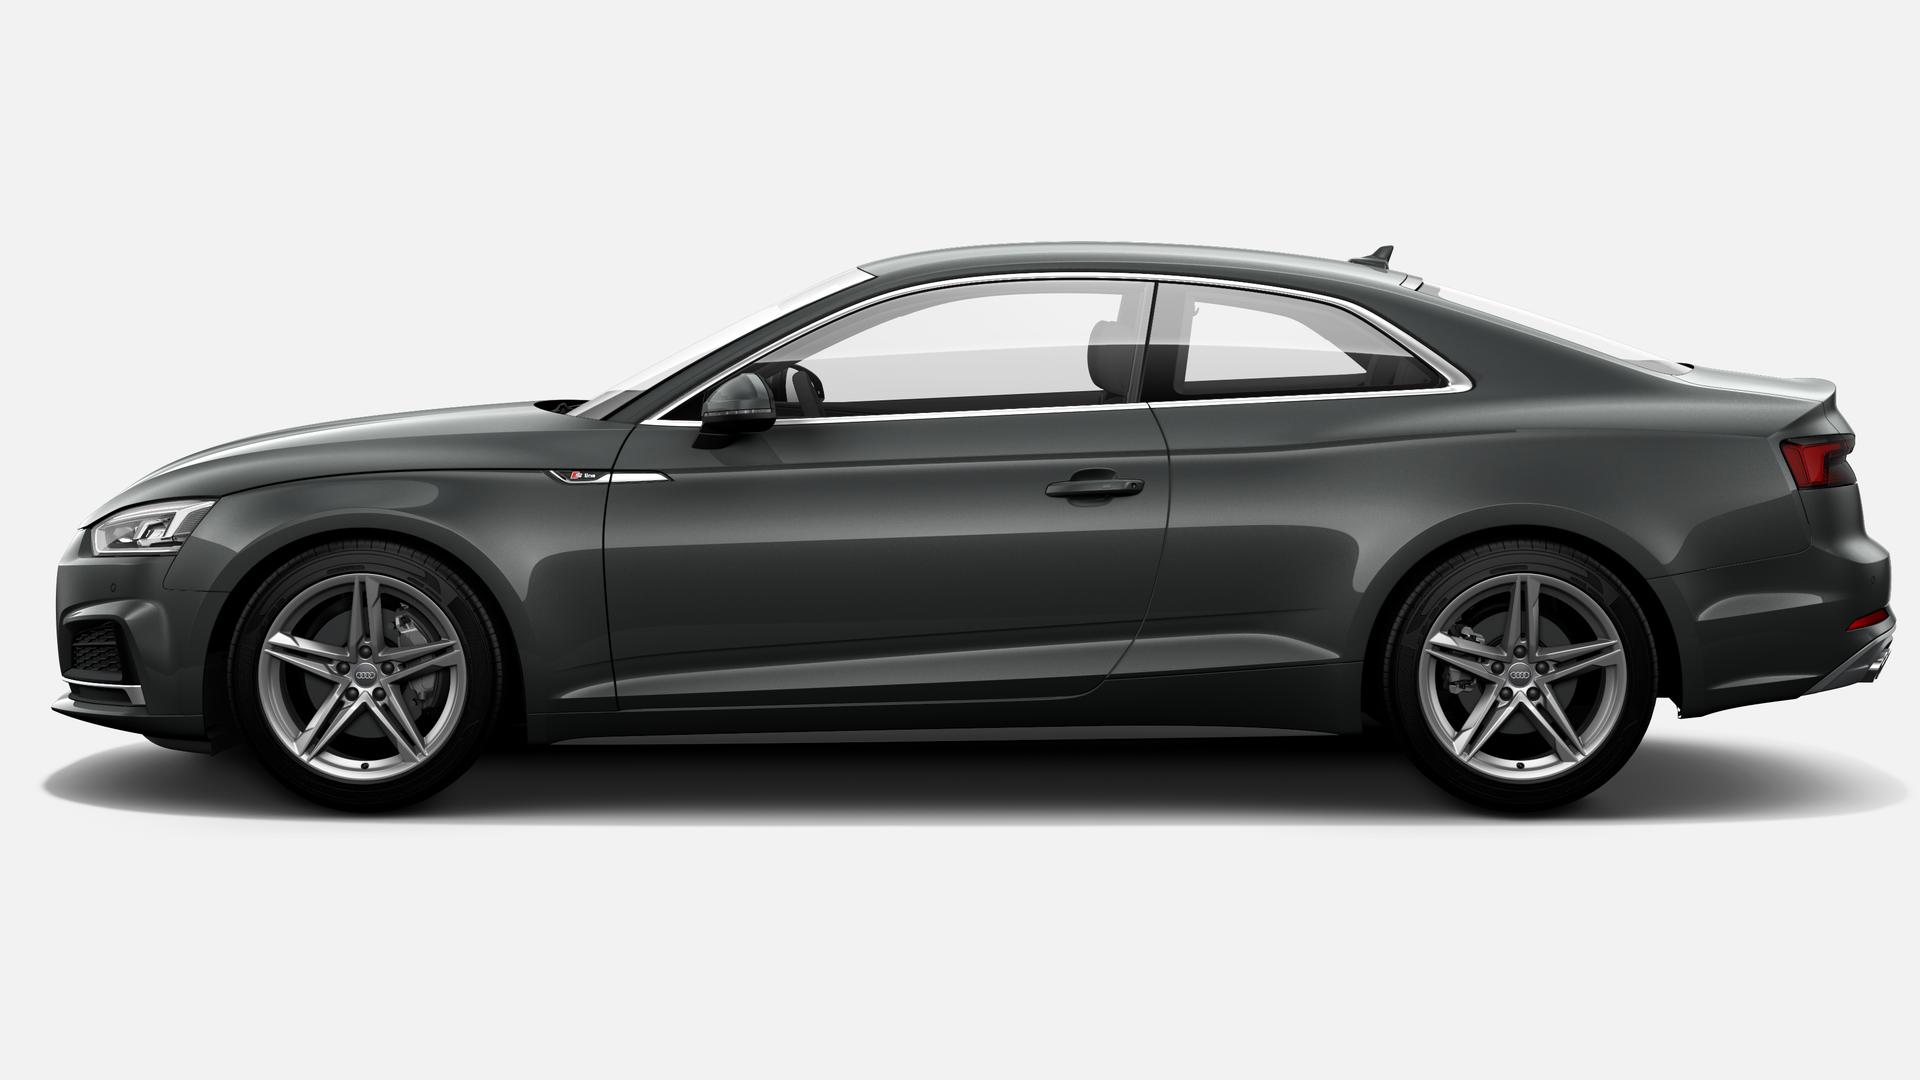 Vista Lateral izquierda de Audi A5 Coupe 2.0 TDI S line S tronic 140 kW (190 CV)